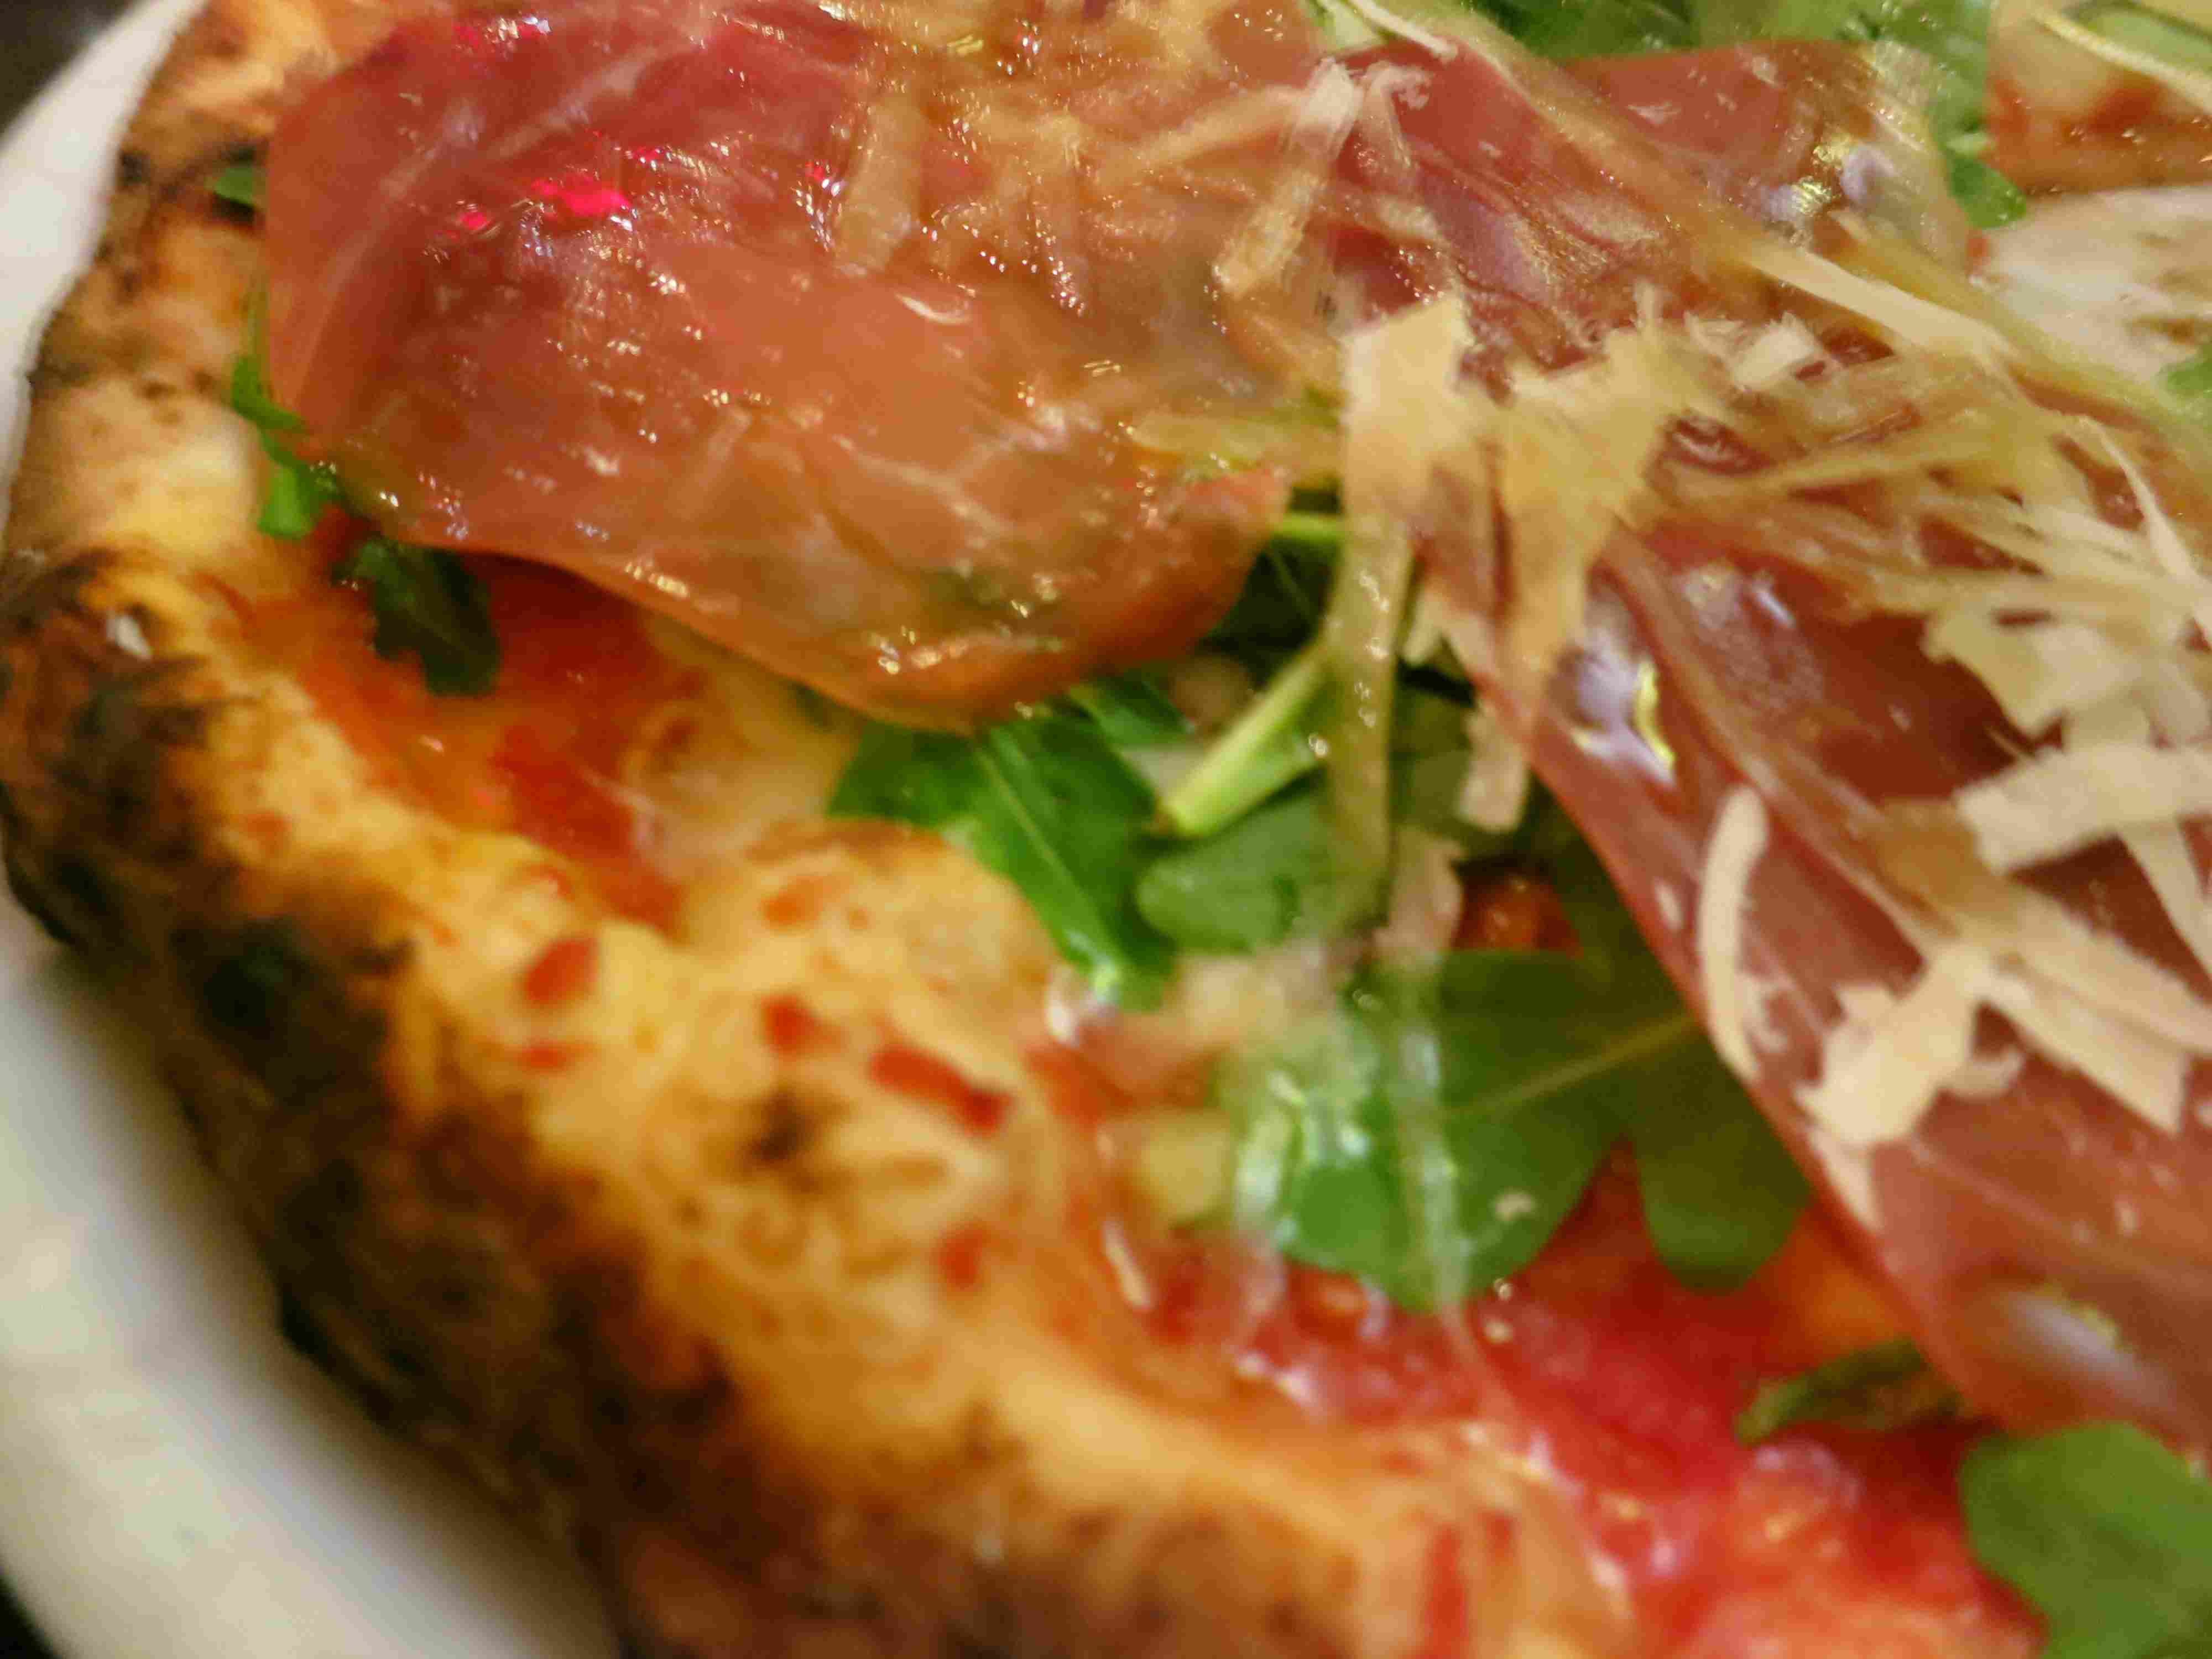 Pizza from Keste